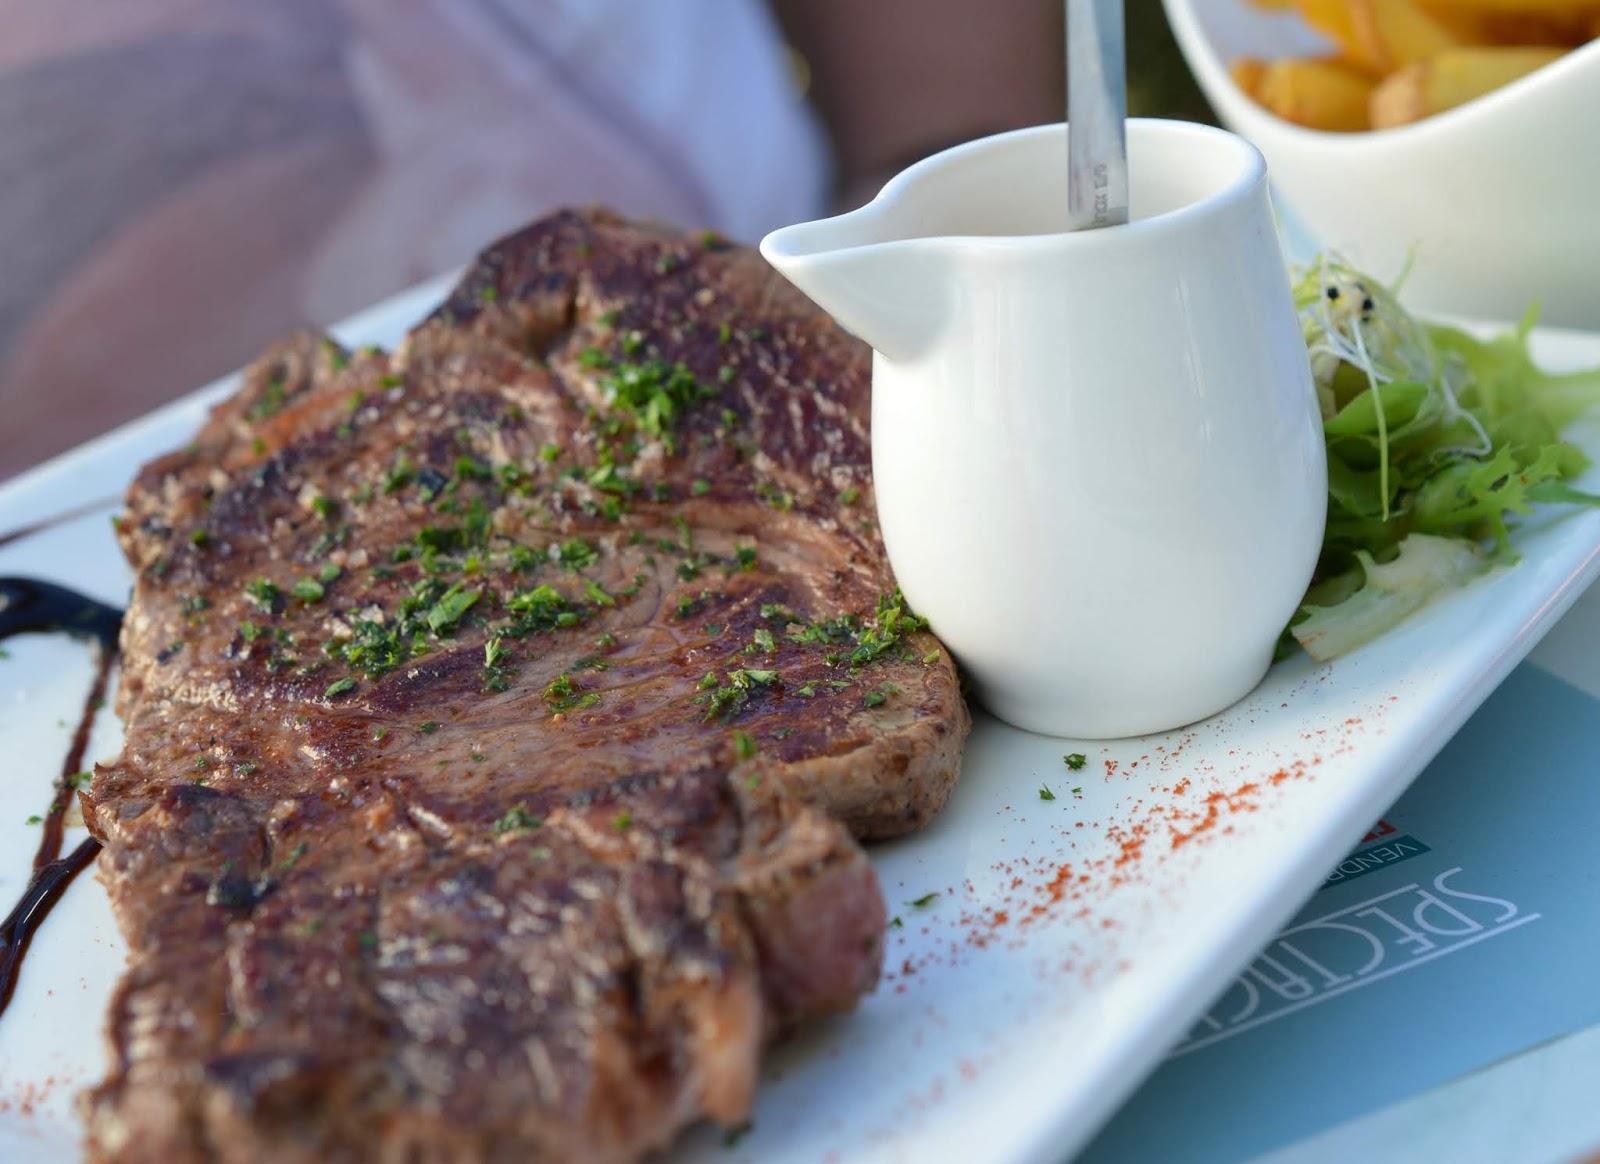 Les Ecureuils Campsite, Vendee - A Eurocamp Site near Puy du Fou (Full Review) - Steak from Amy's House